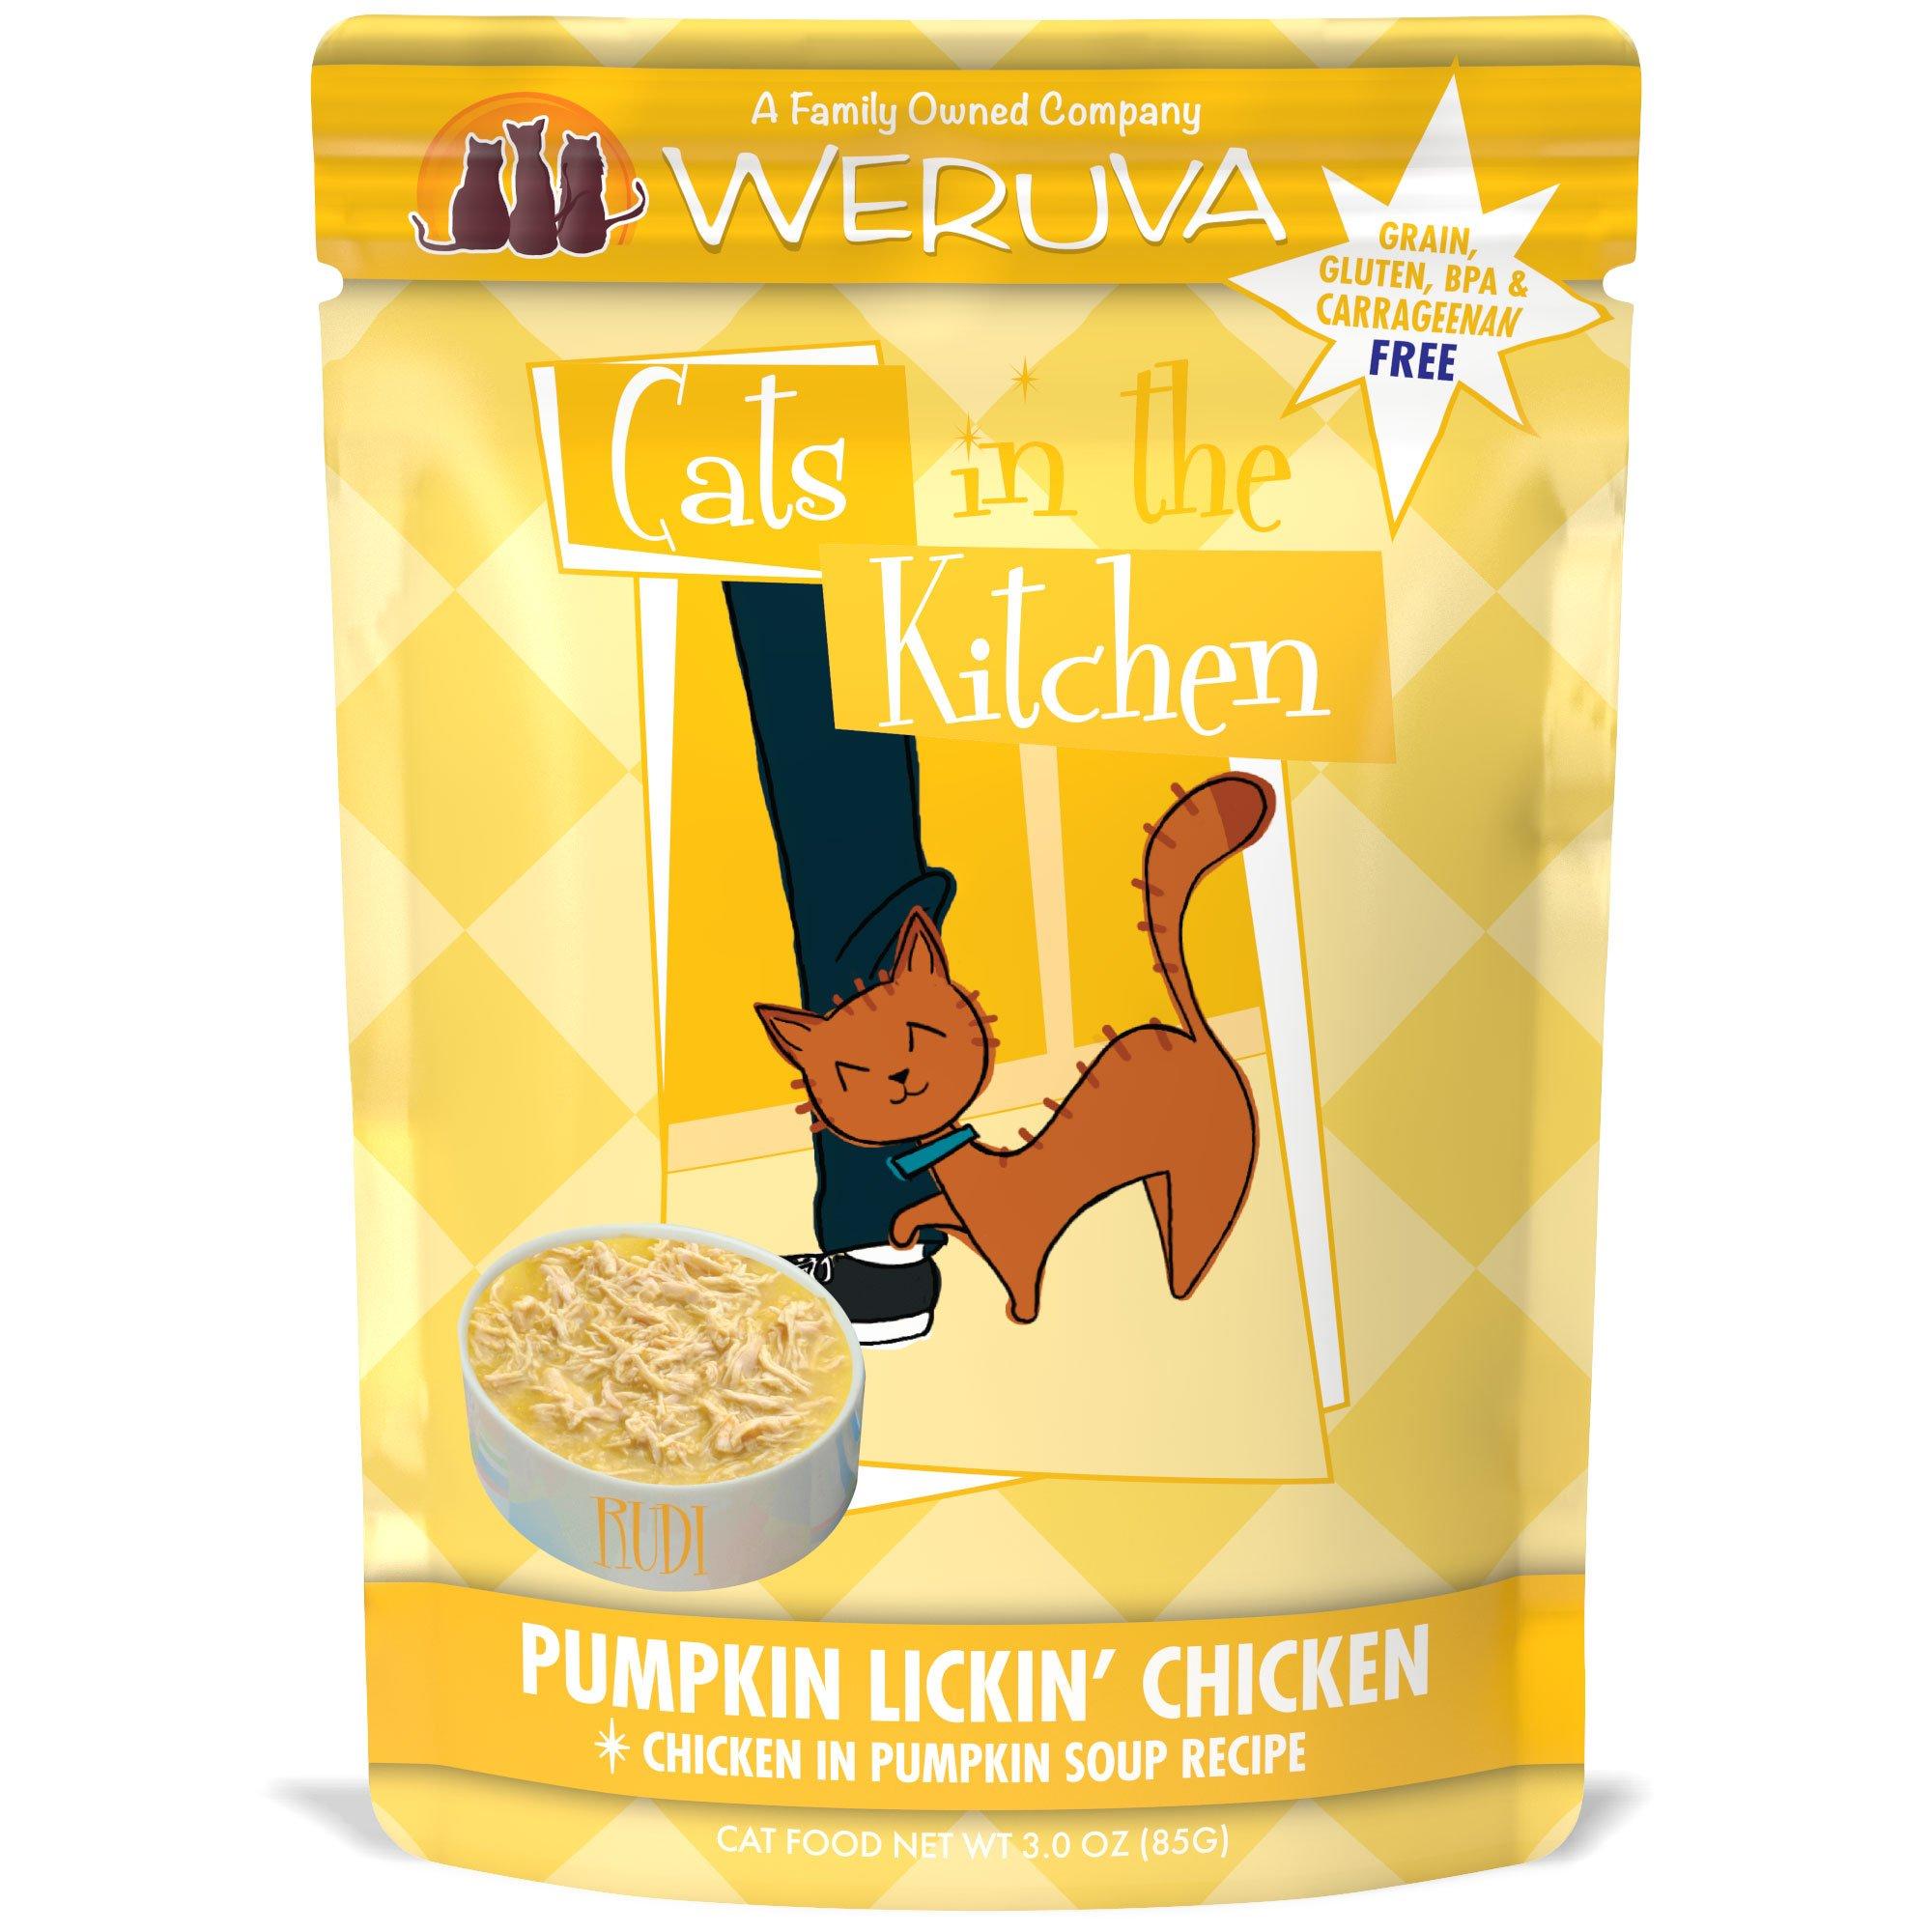 Weruva Cats in the Kitchen, Pumpkin Lickin' Chicken with Chicken Breast in Pumpkin Soup Cat Food, 3oz Pouch (Pack of 8)